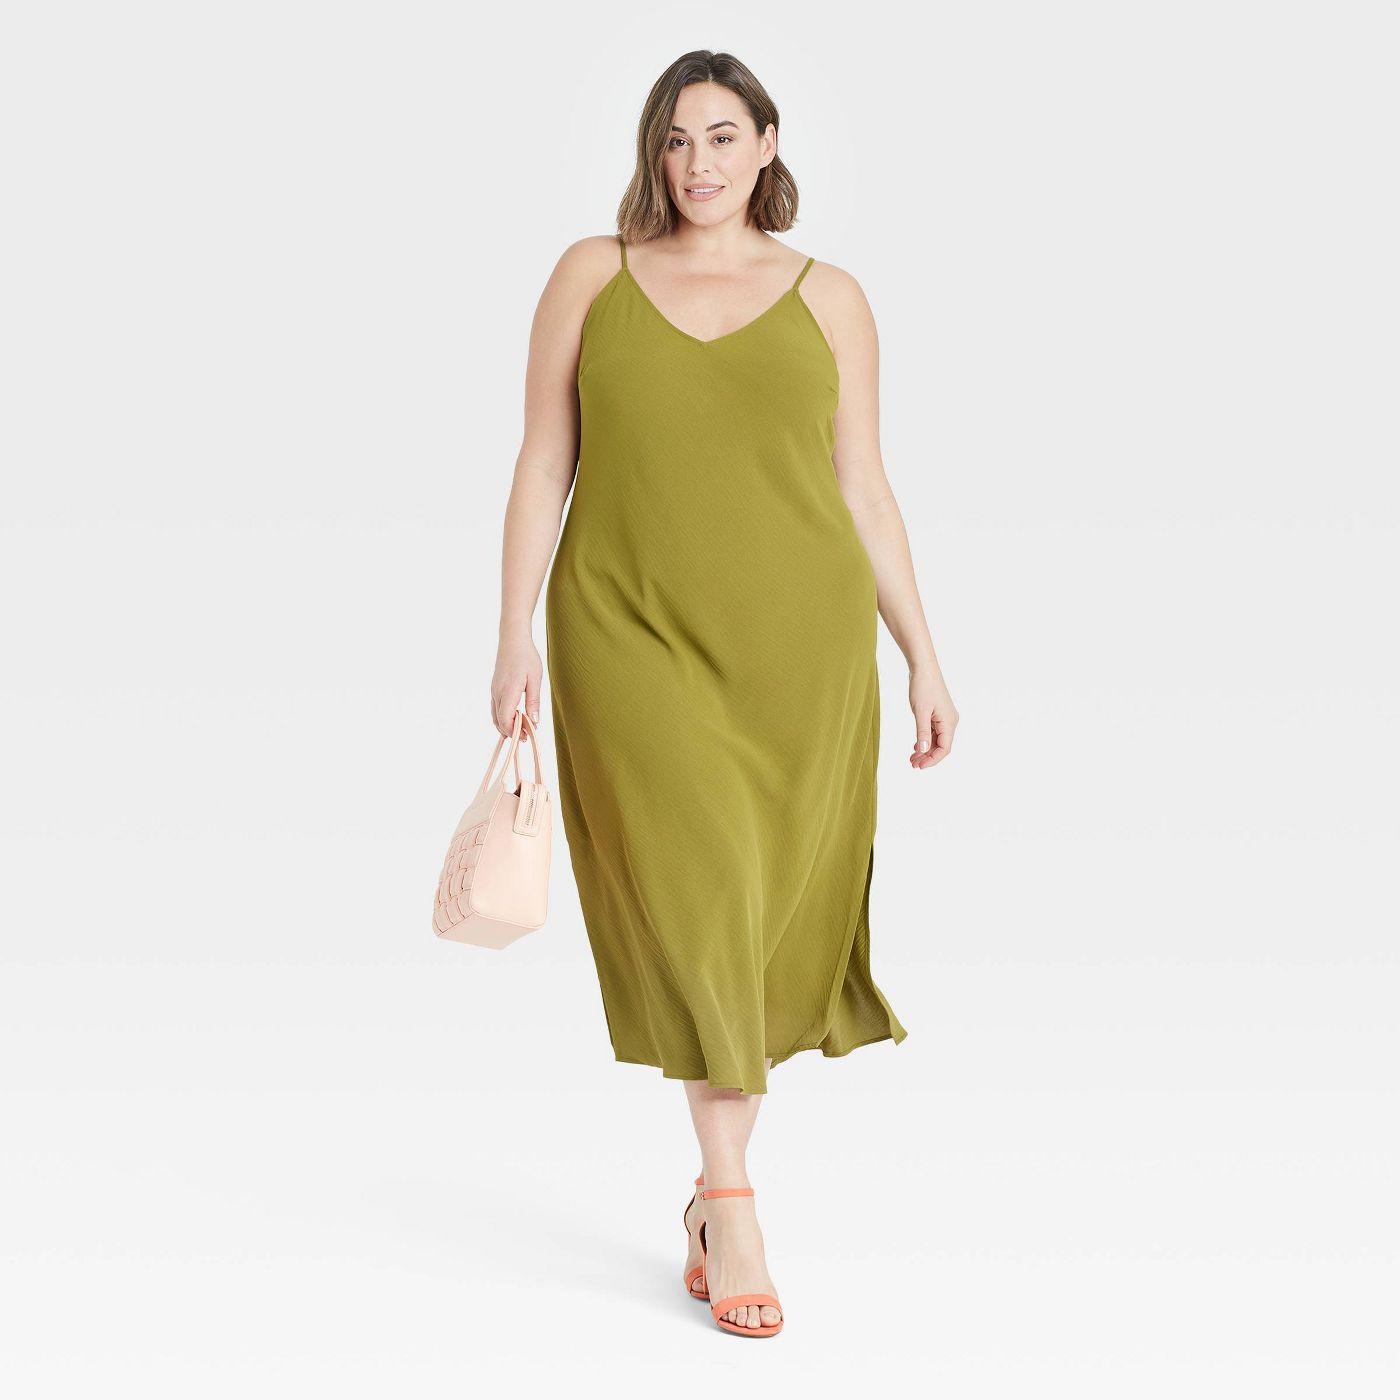 Plus Size Shopping on a  Budget Fashion